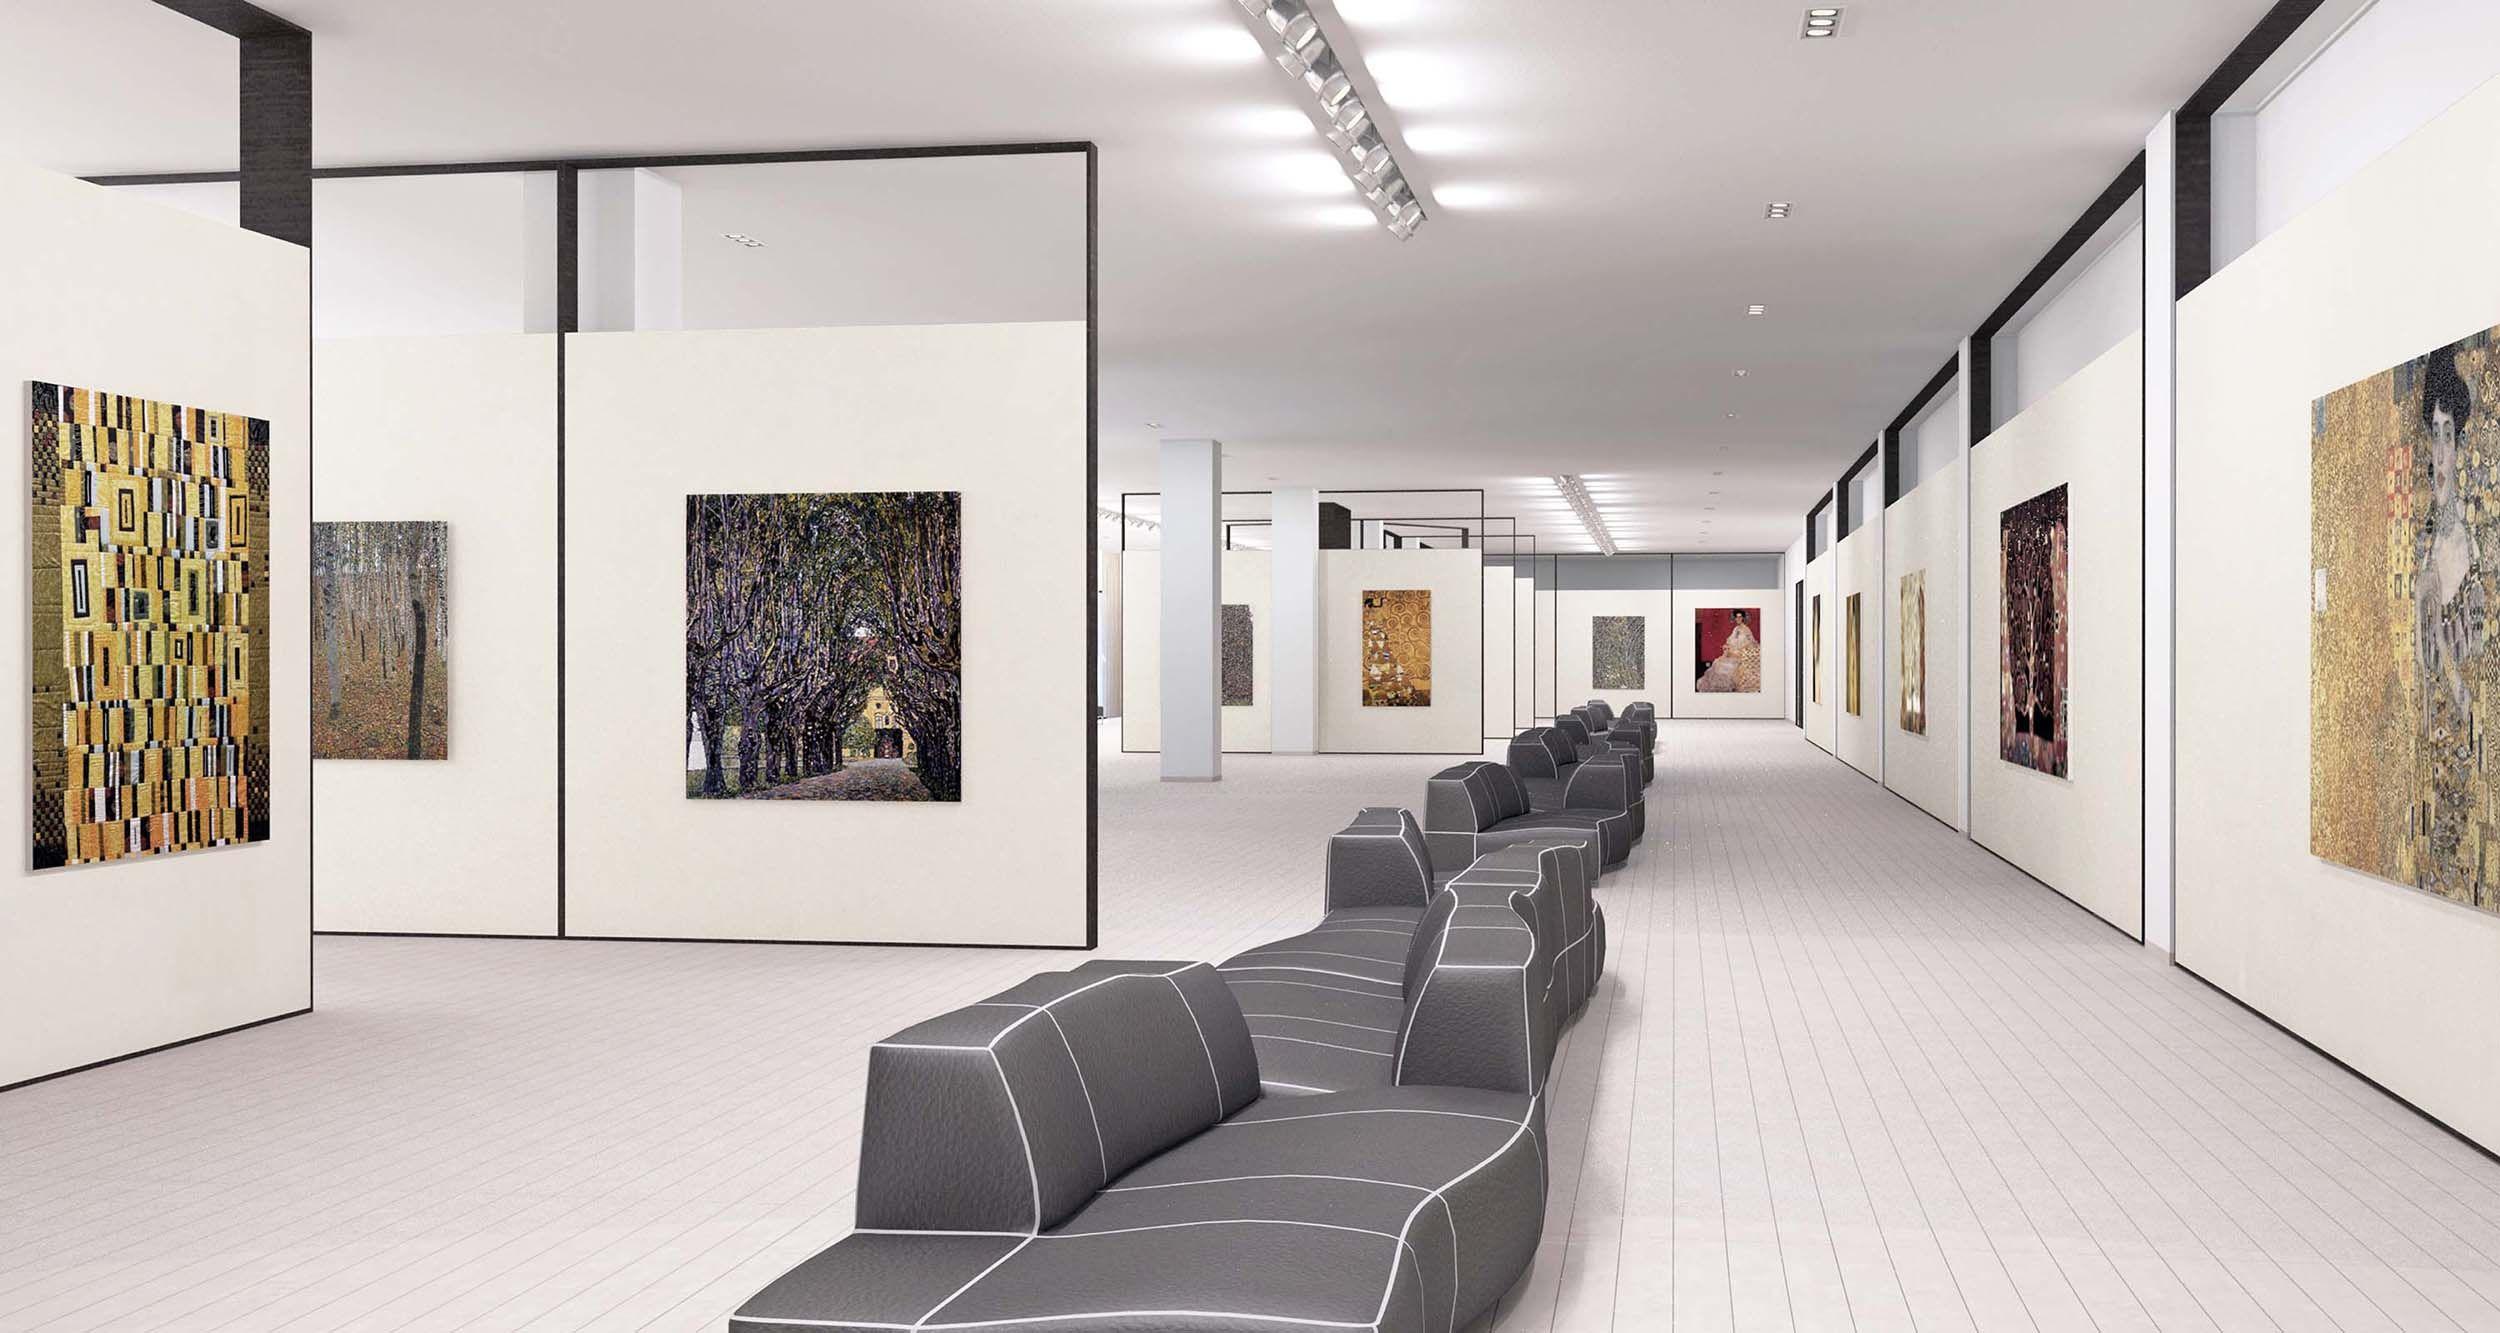 Frames And Lights Art Gallery Interior Gallery Design Interior